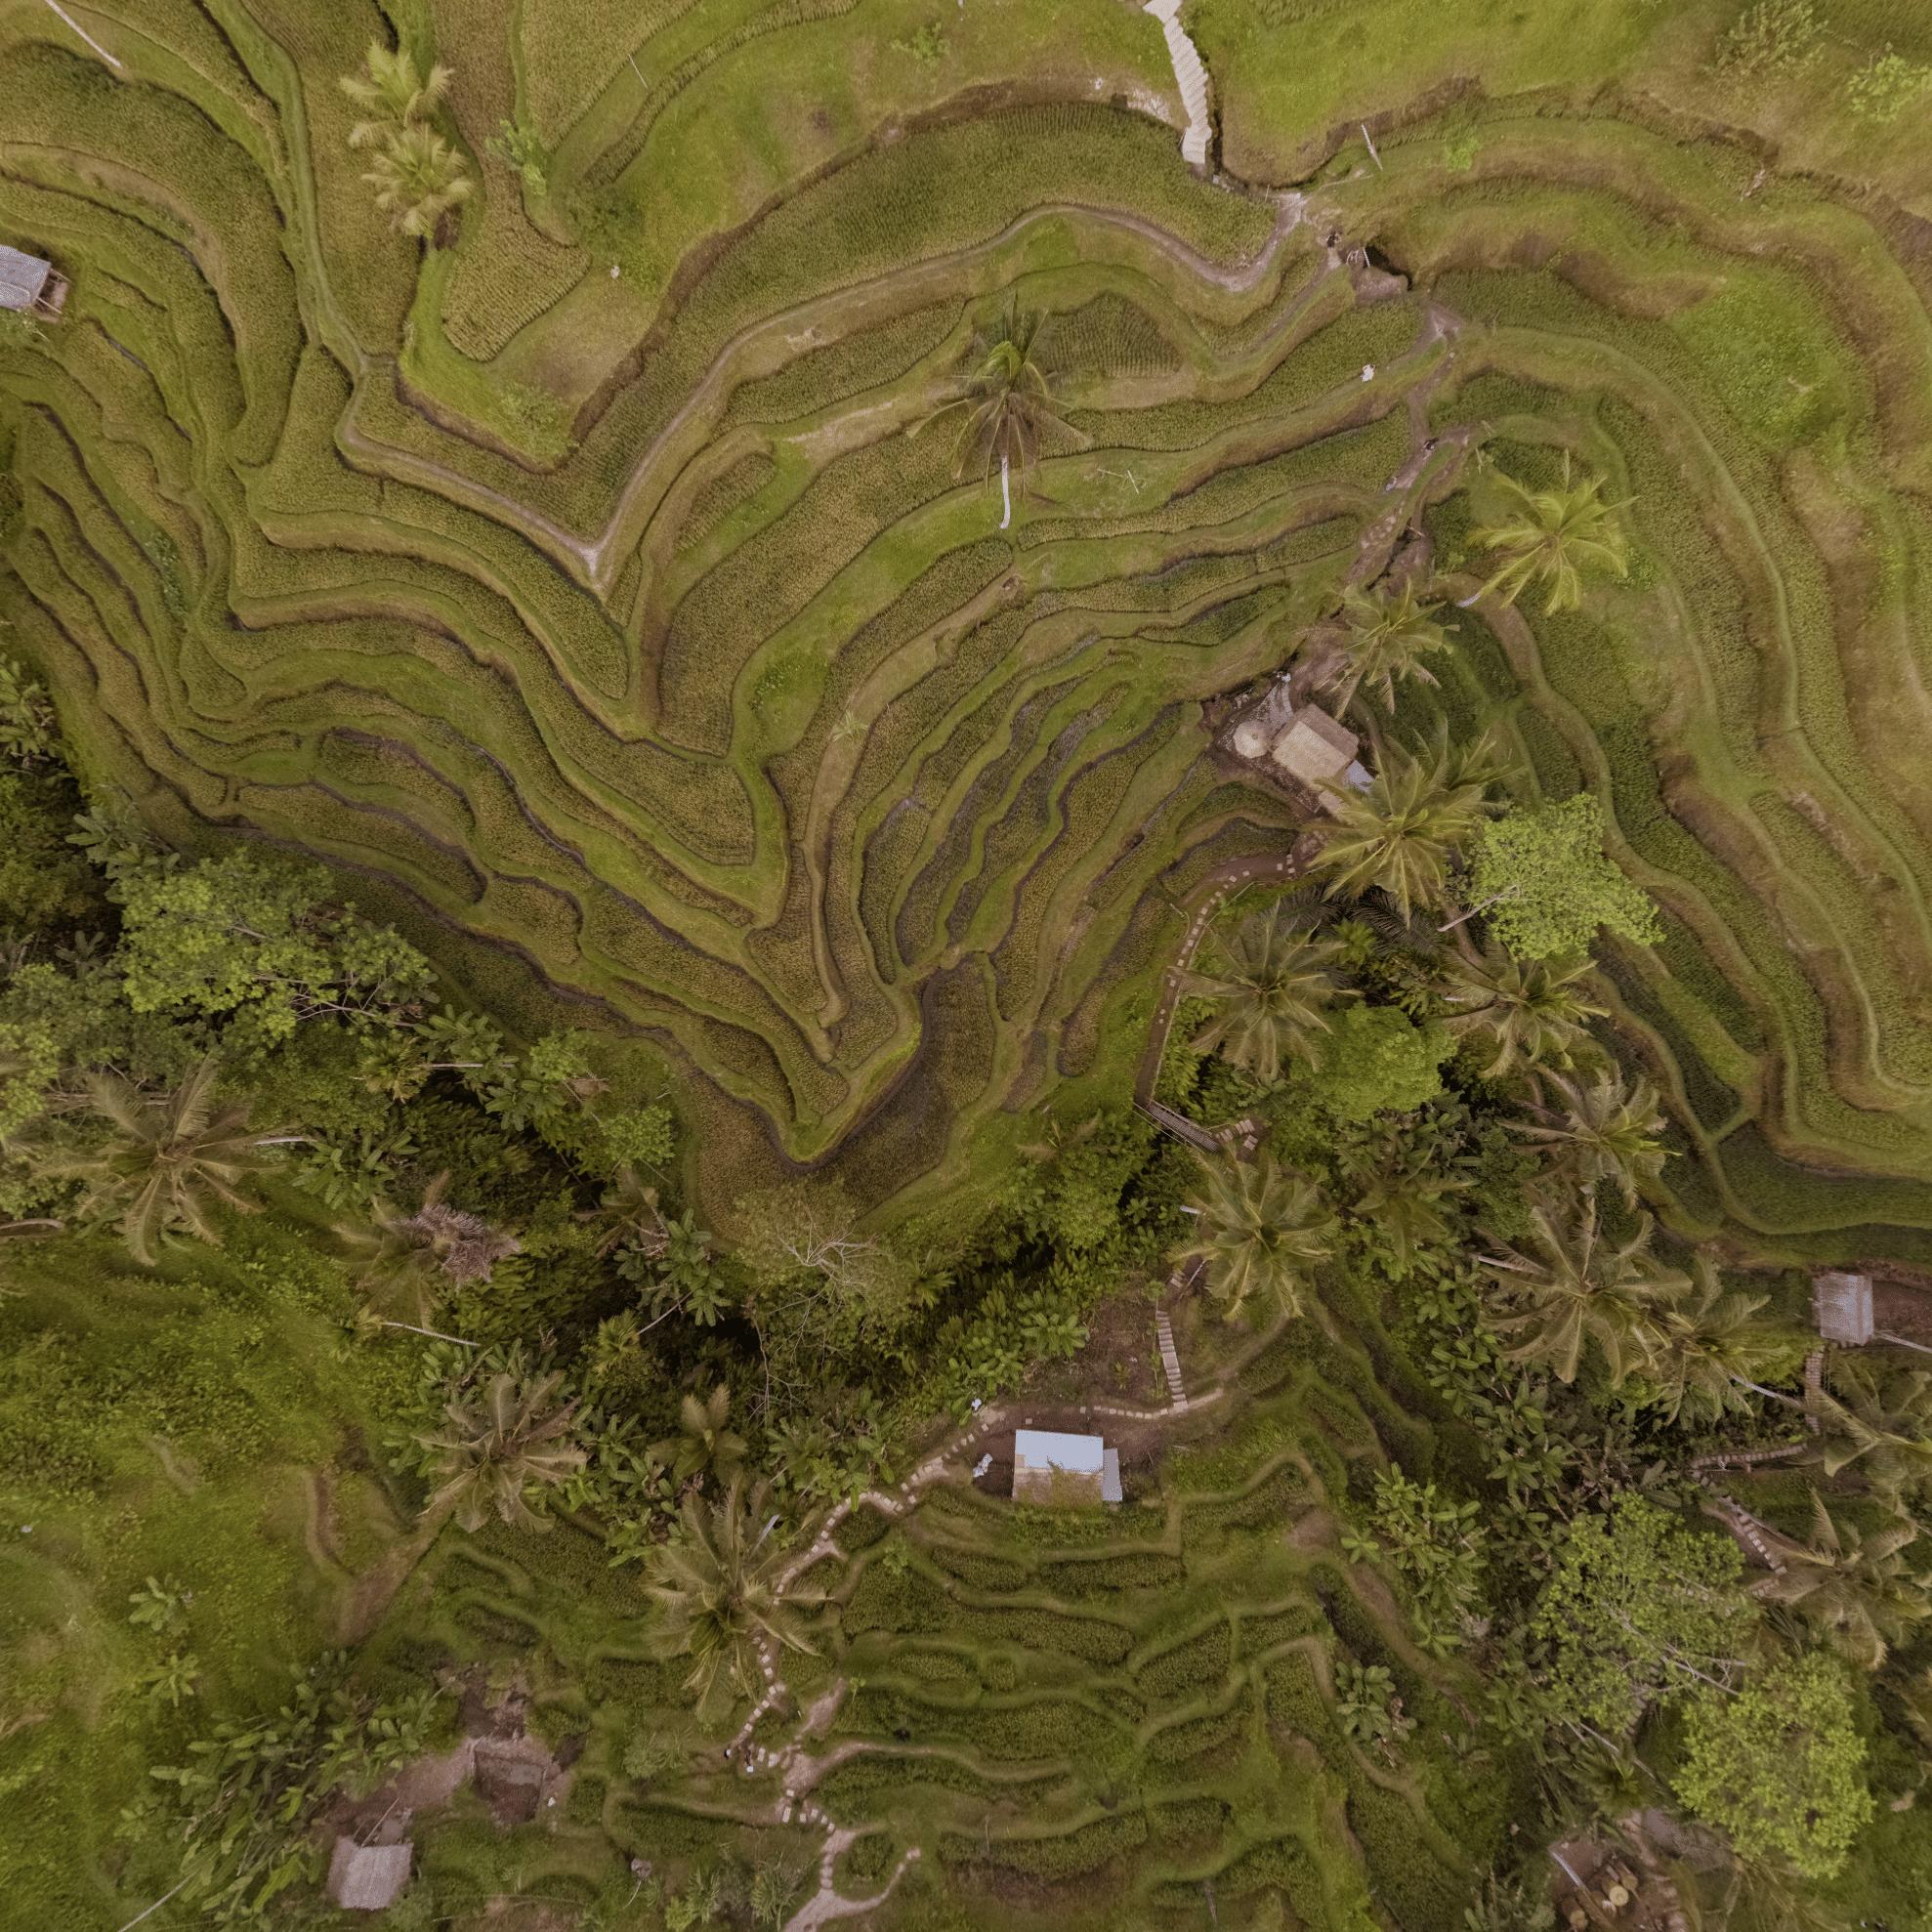 tegallalang rice terrace bali indonesien patrick roddelkopf patrick roddelkopf fotografie